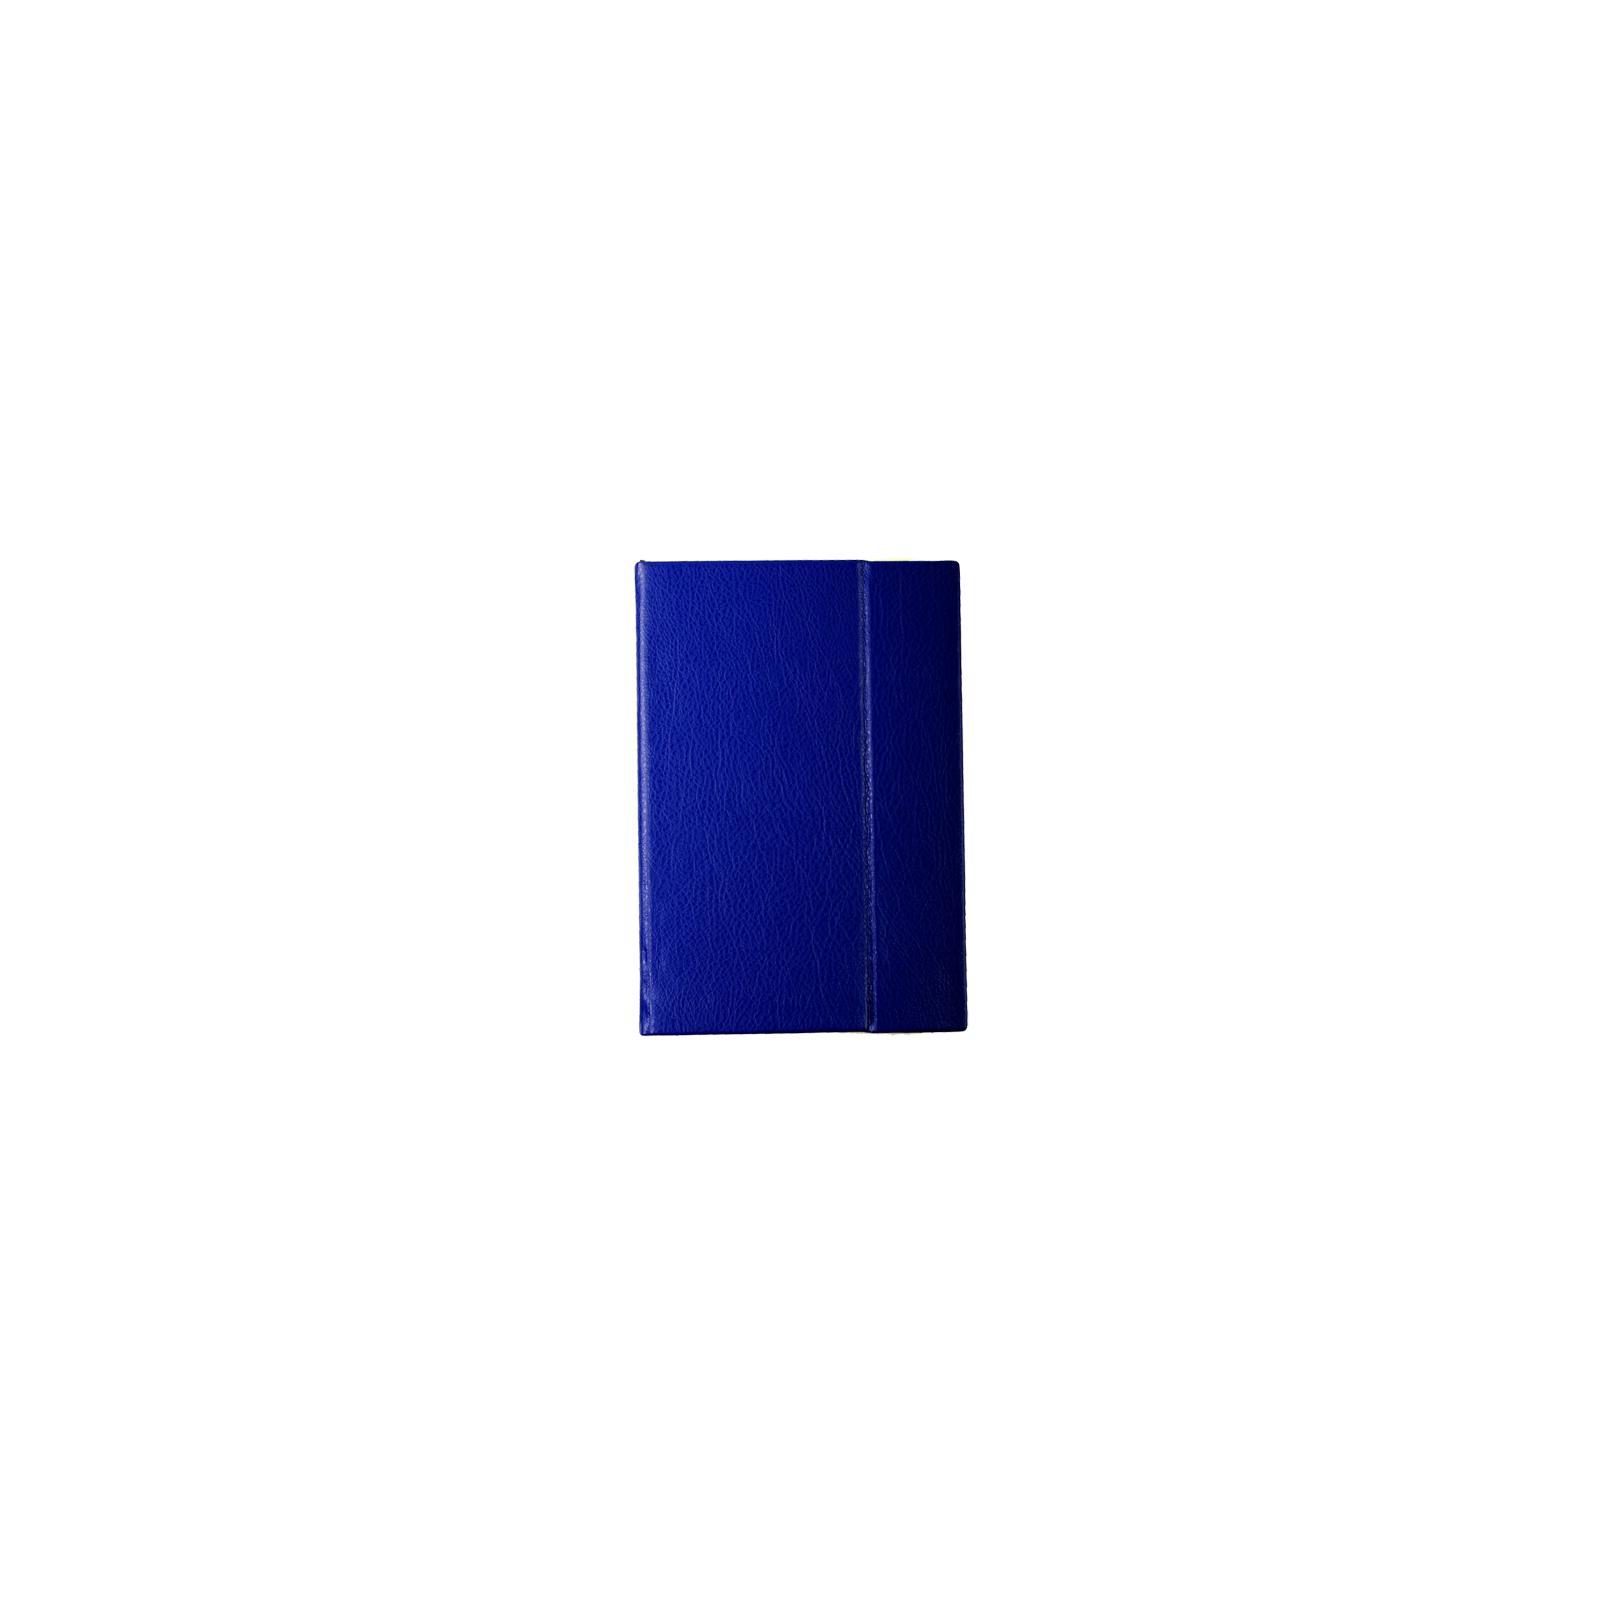 Чехол для планшета Vento 9 Desire Bright - rich blue изображение 2